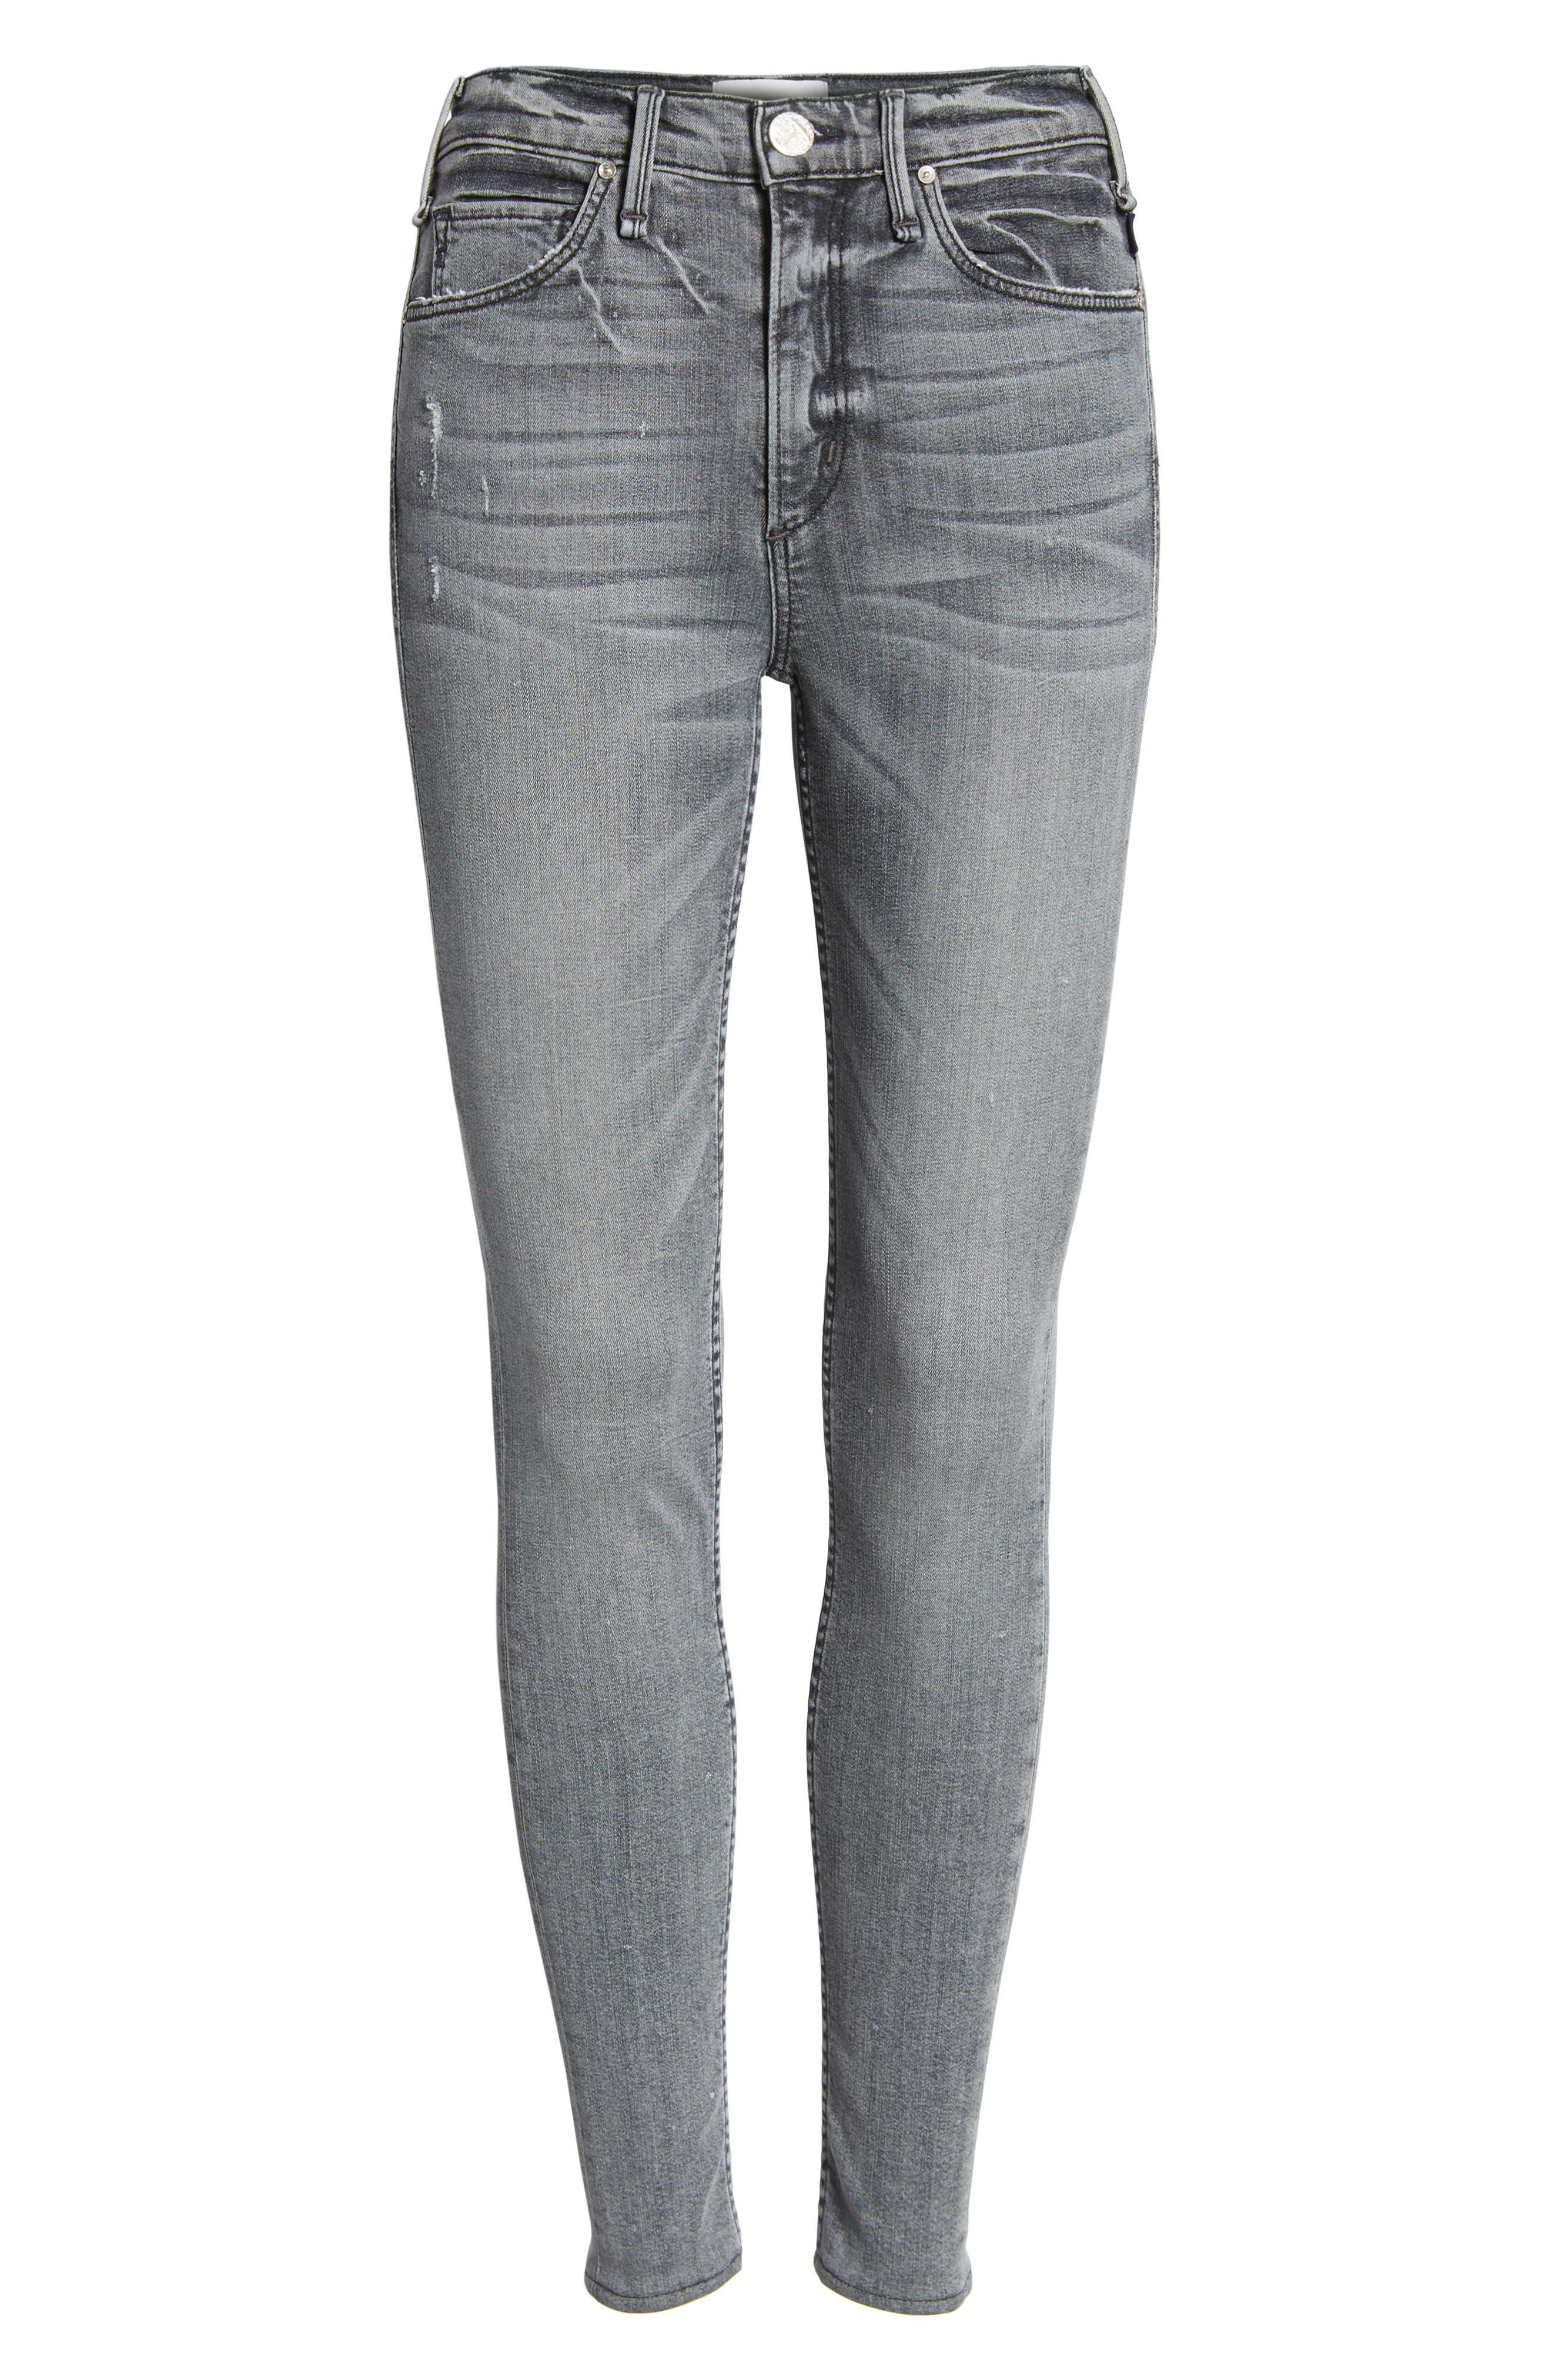 Newton High Waist Skinny Jeans,                             Alternate thumbnail 7, color,                             021